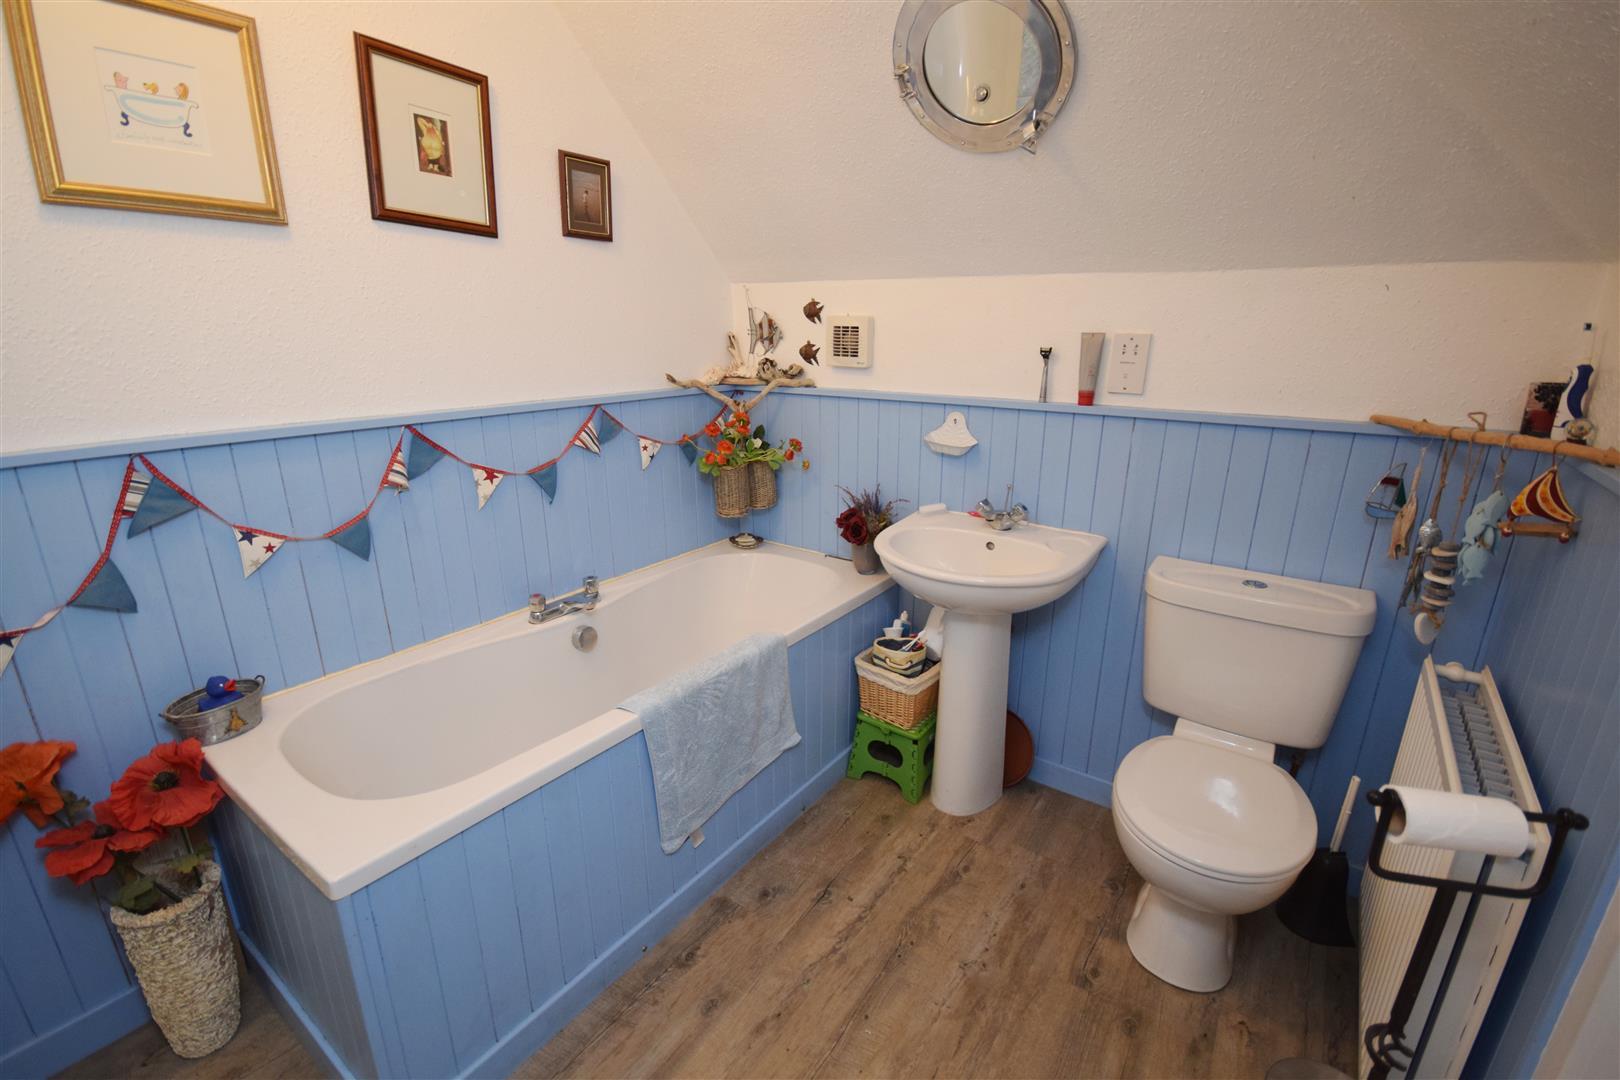 The Croft, Townhead, Auchterarder, Perthshire, PH3 1JG, UK